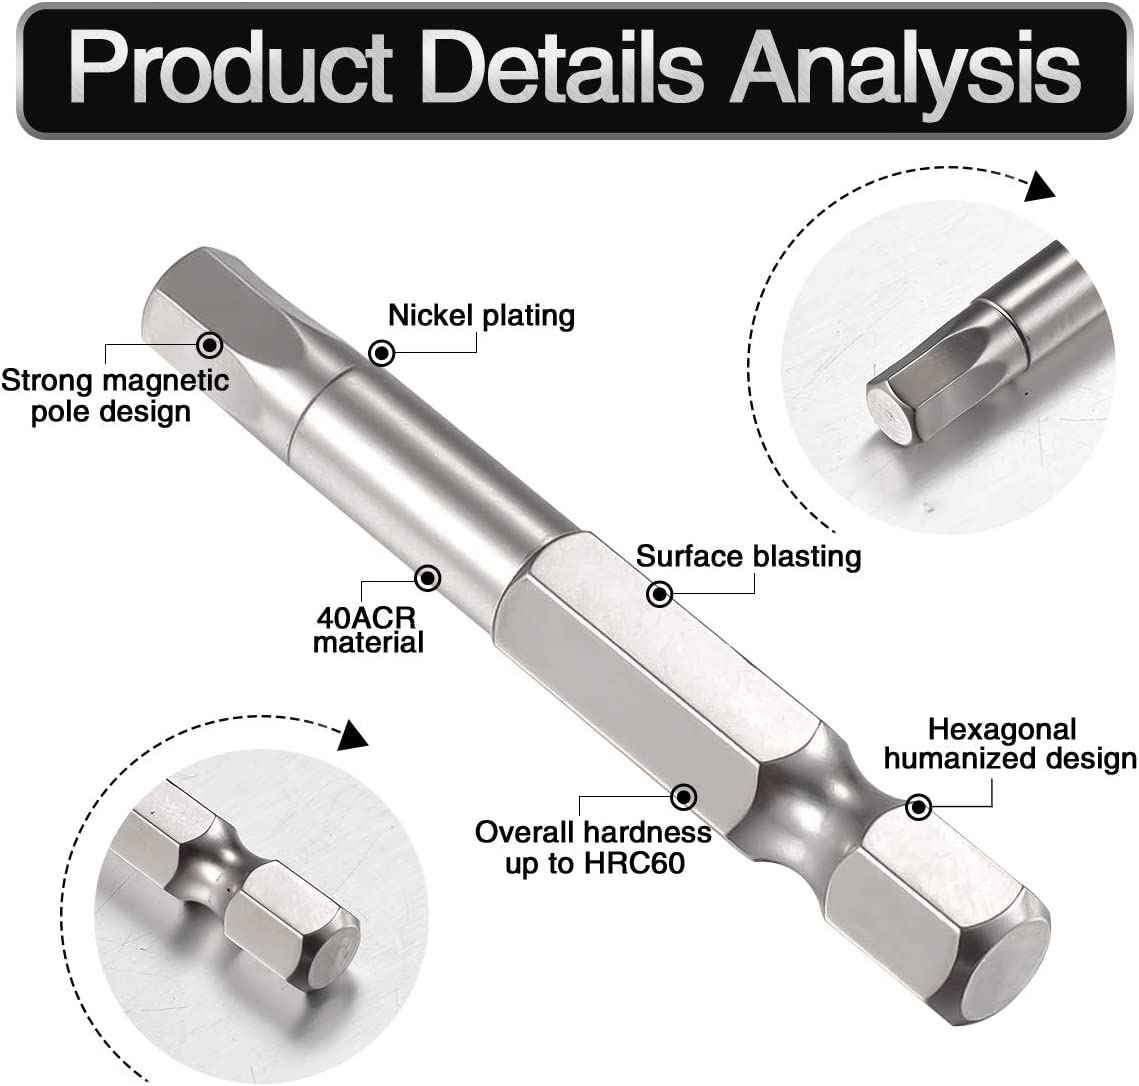 Juego de 4 brocas hexagonales magn/éticas de doble extremo puntas largas hexagonales para agujeros profundos de tornillo HOHXEN 65 mm//110 mm